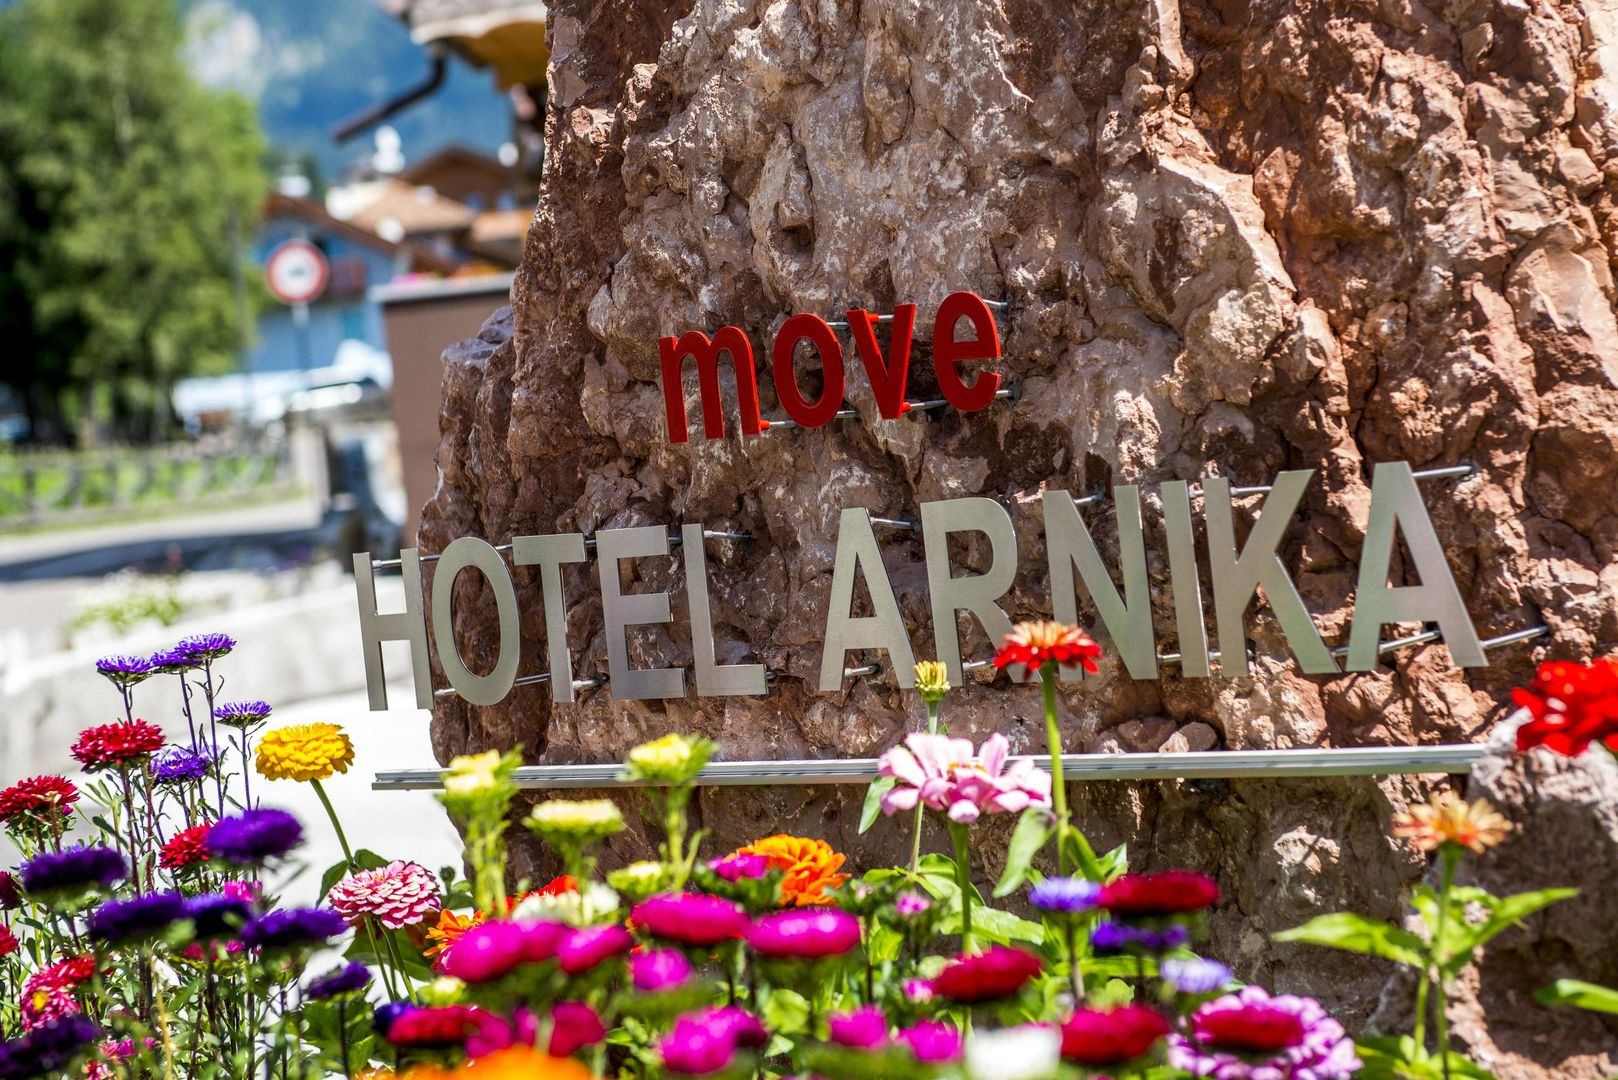 move hotel arnika